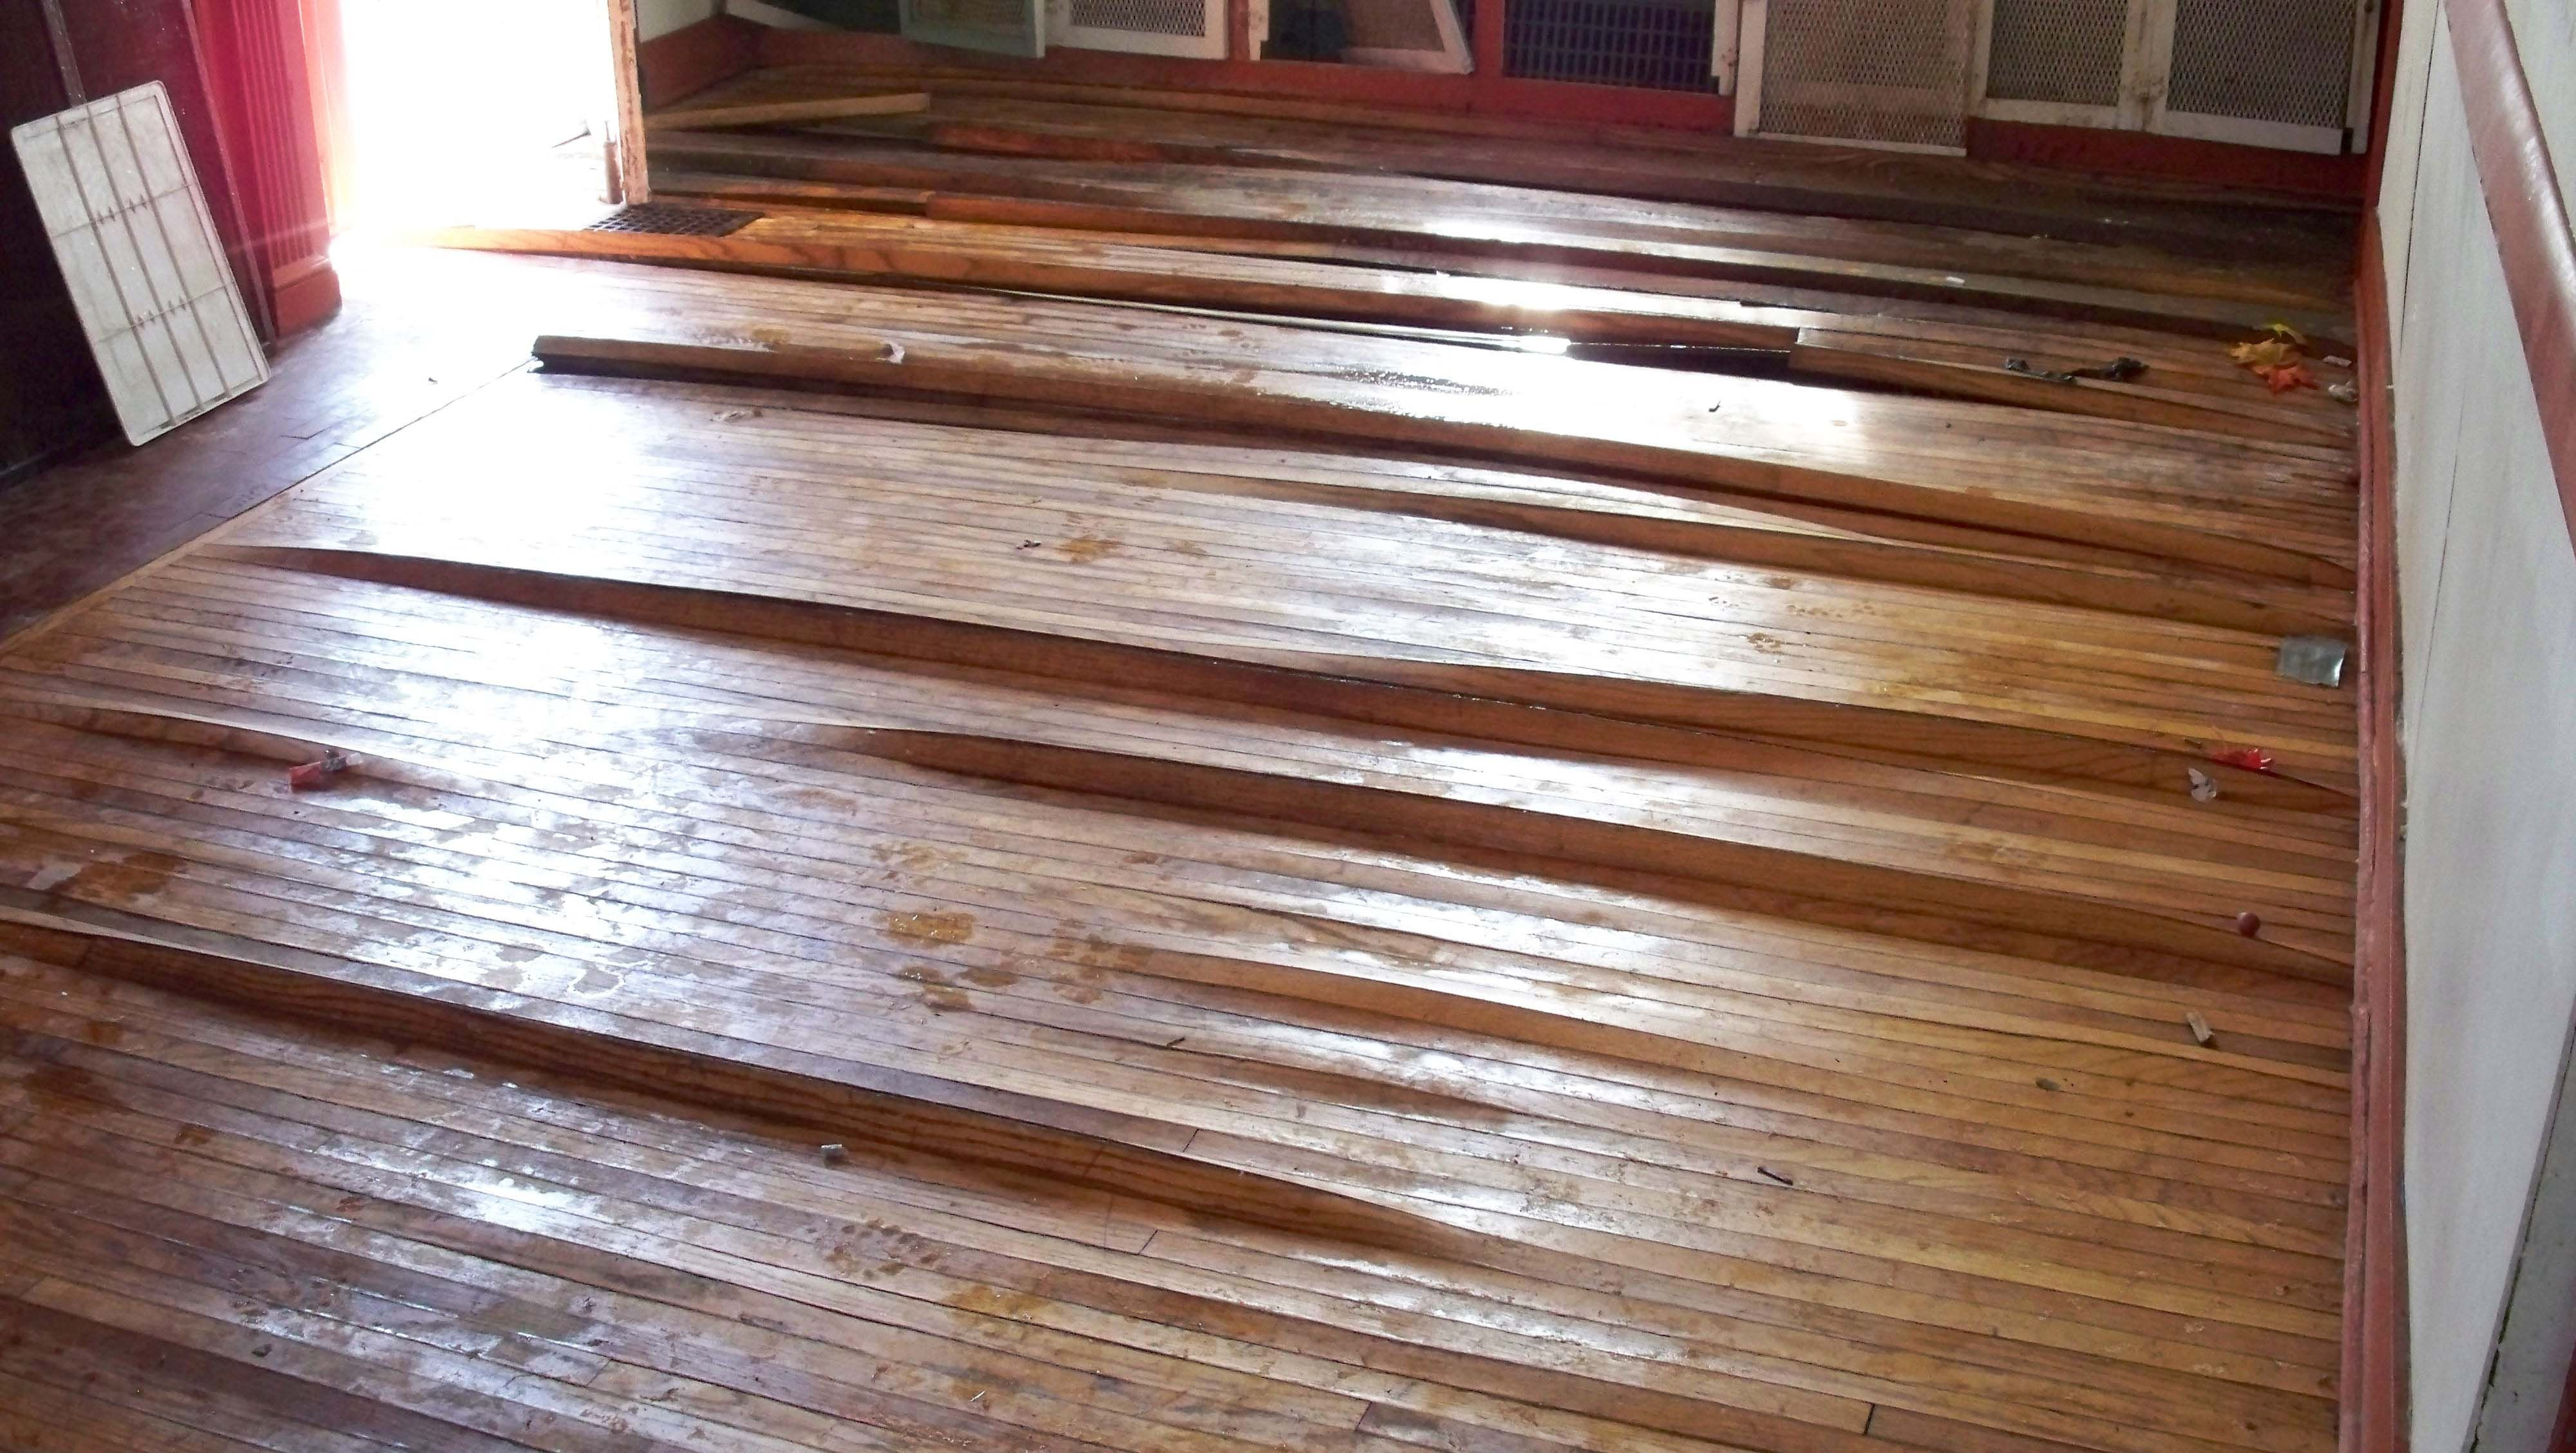 hardwood floor cleaner no residue of hardwood floor water damage warping hardwood floors pinterest regarding hardwood floor water damage warping